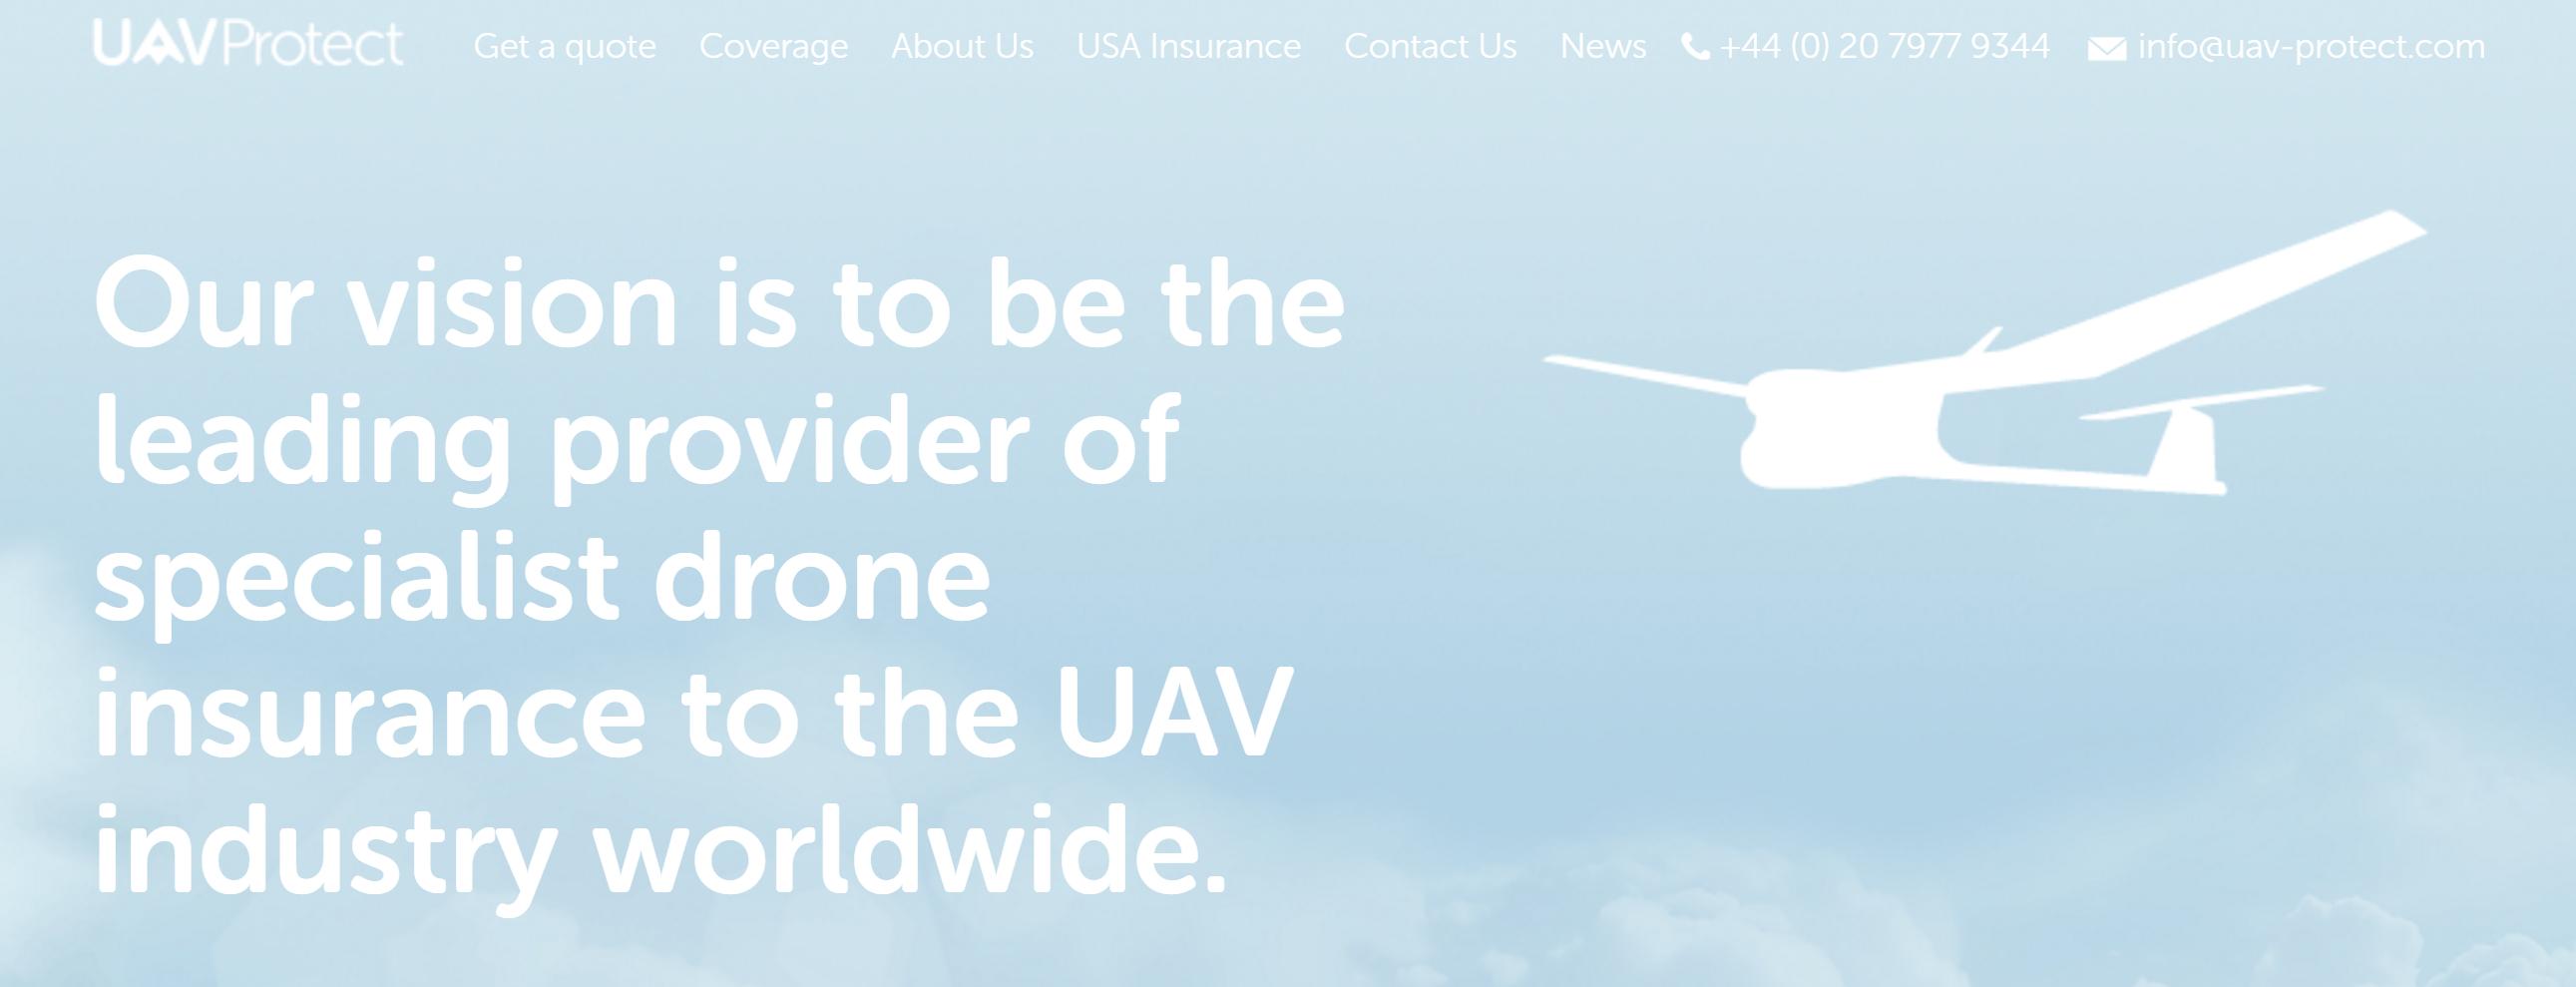 uav protect drone insurance